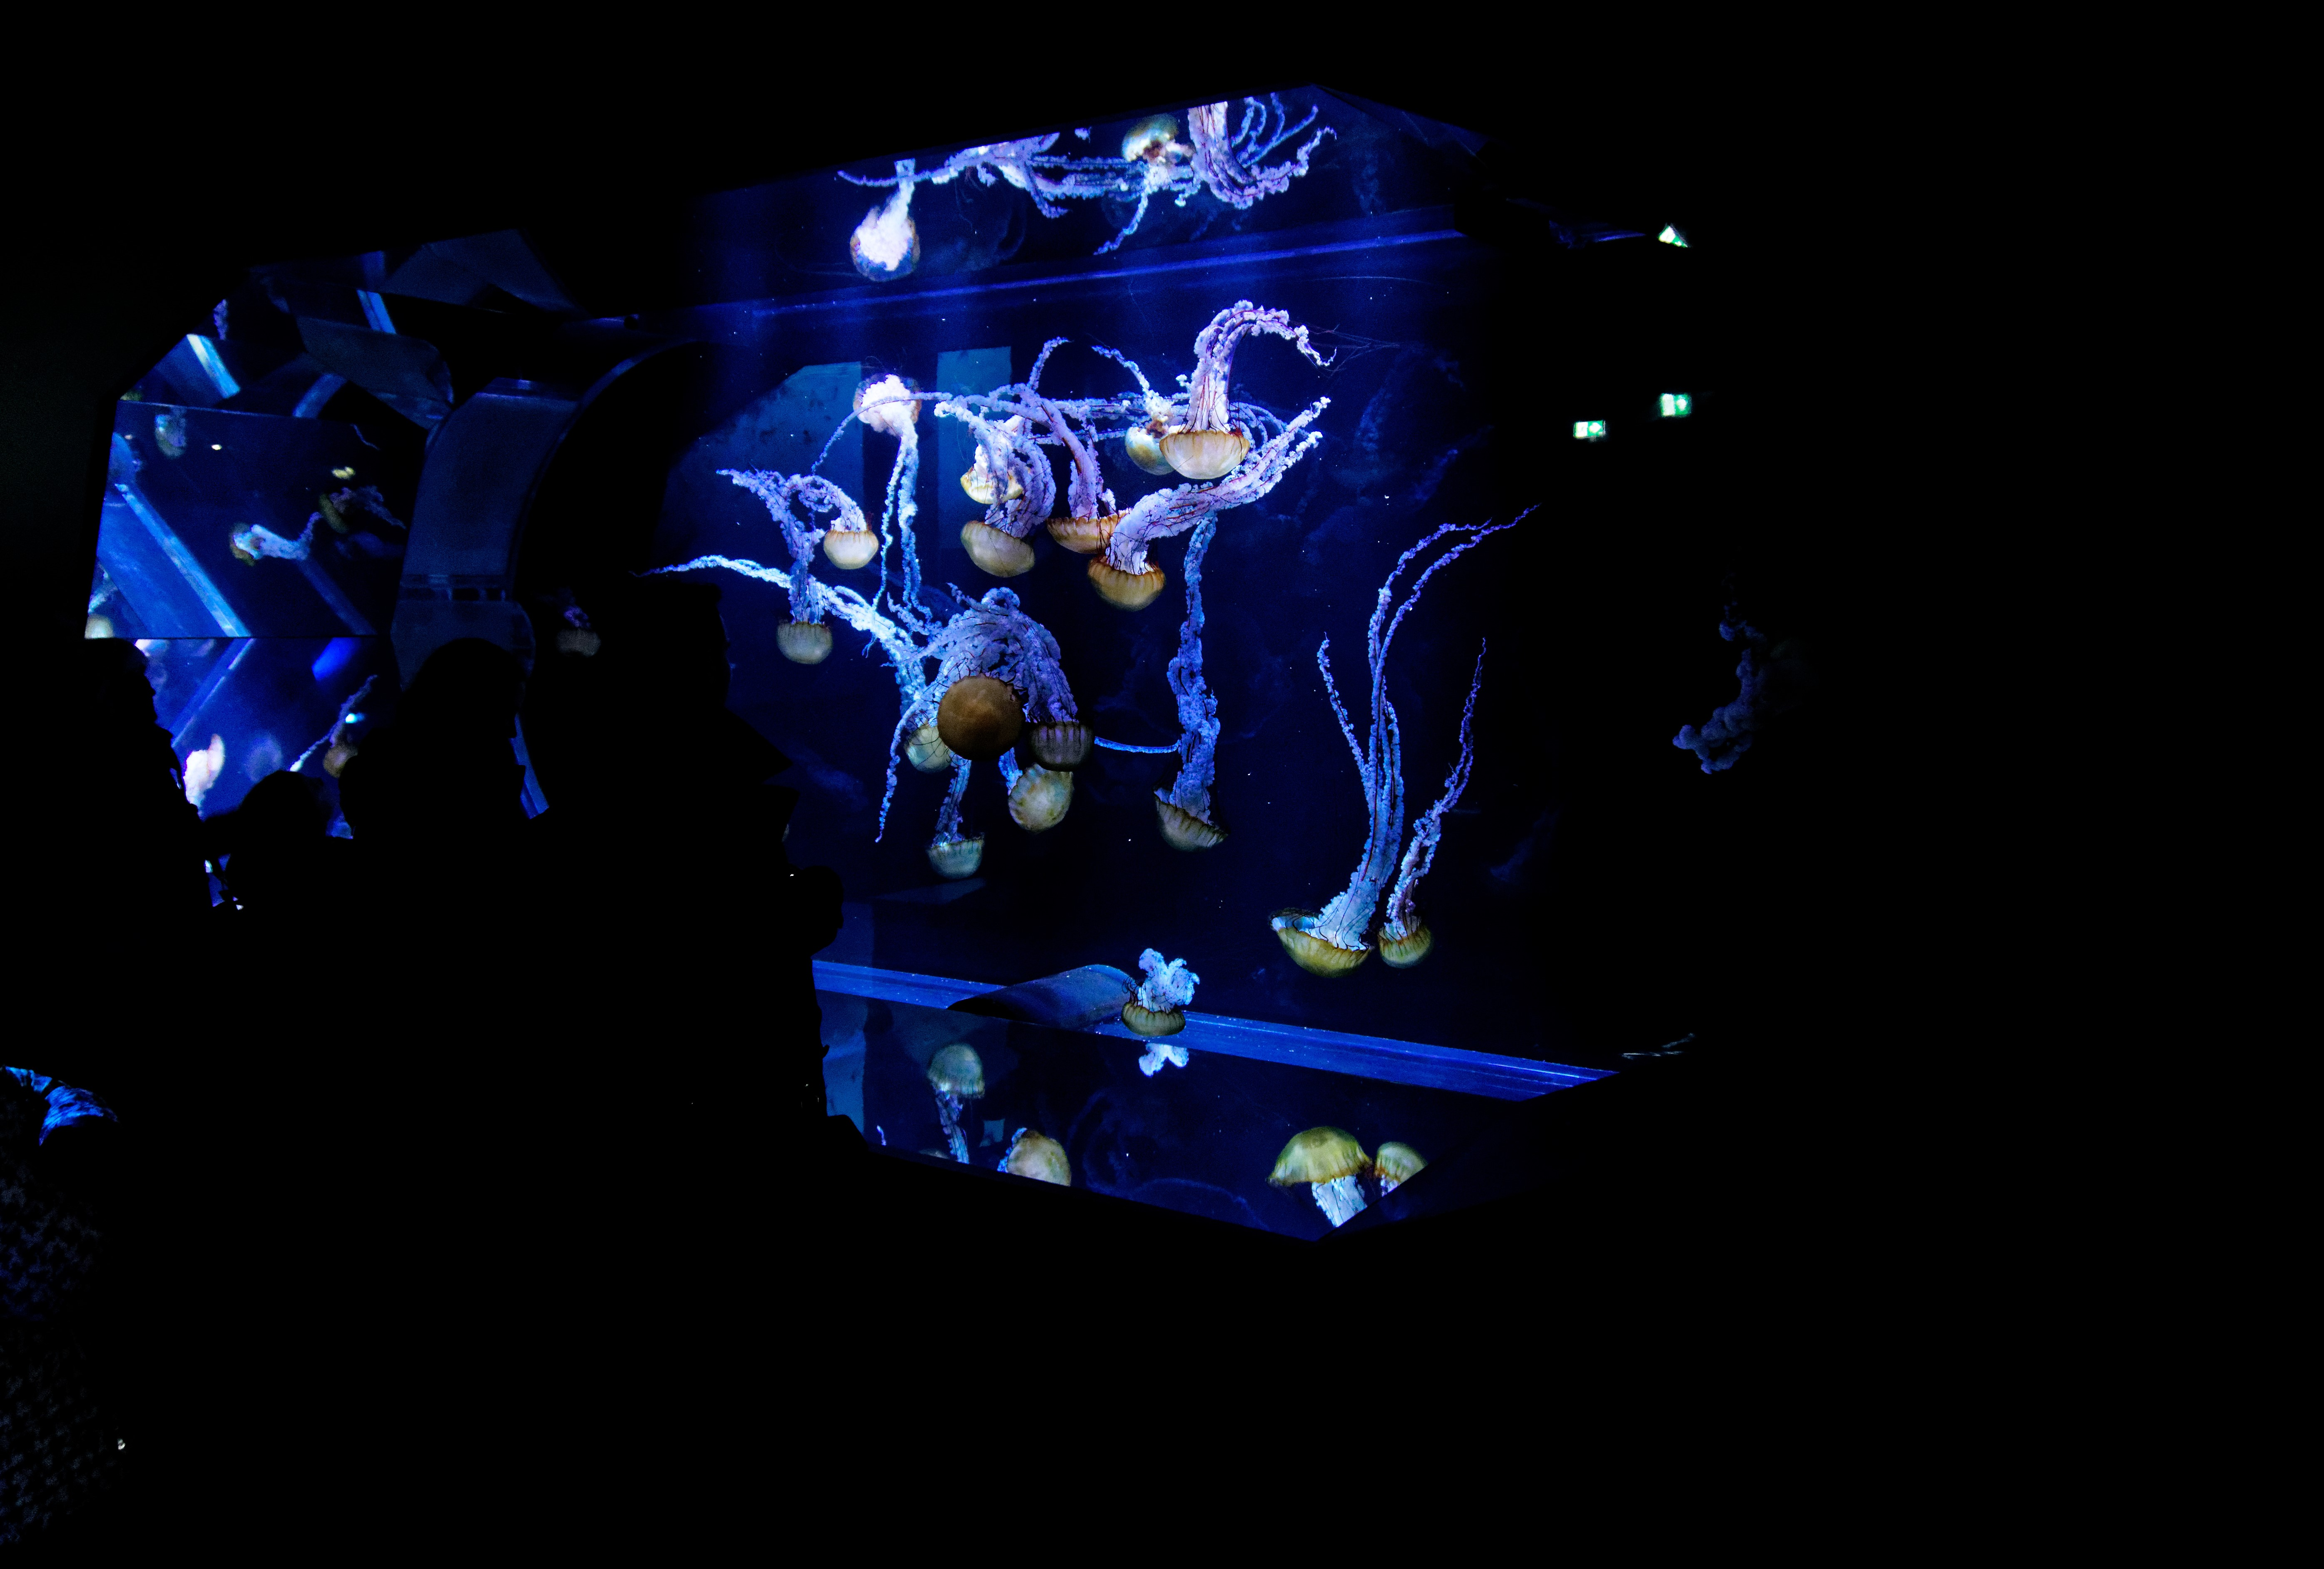 aquarium méduse nausicaà boulogne sur mer